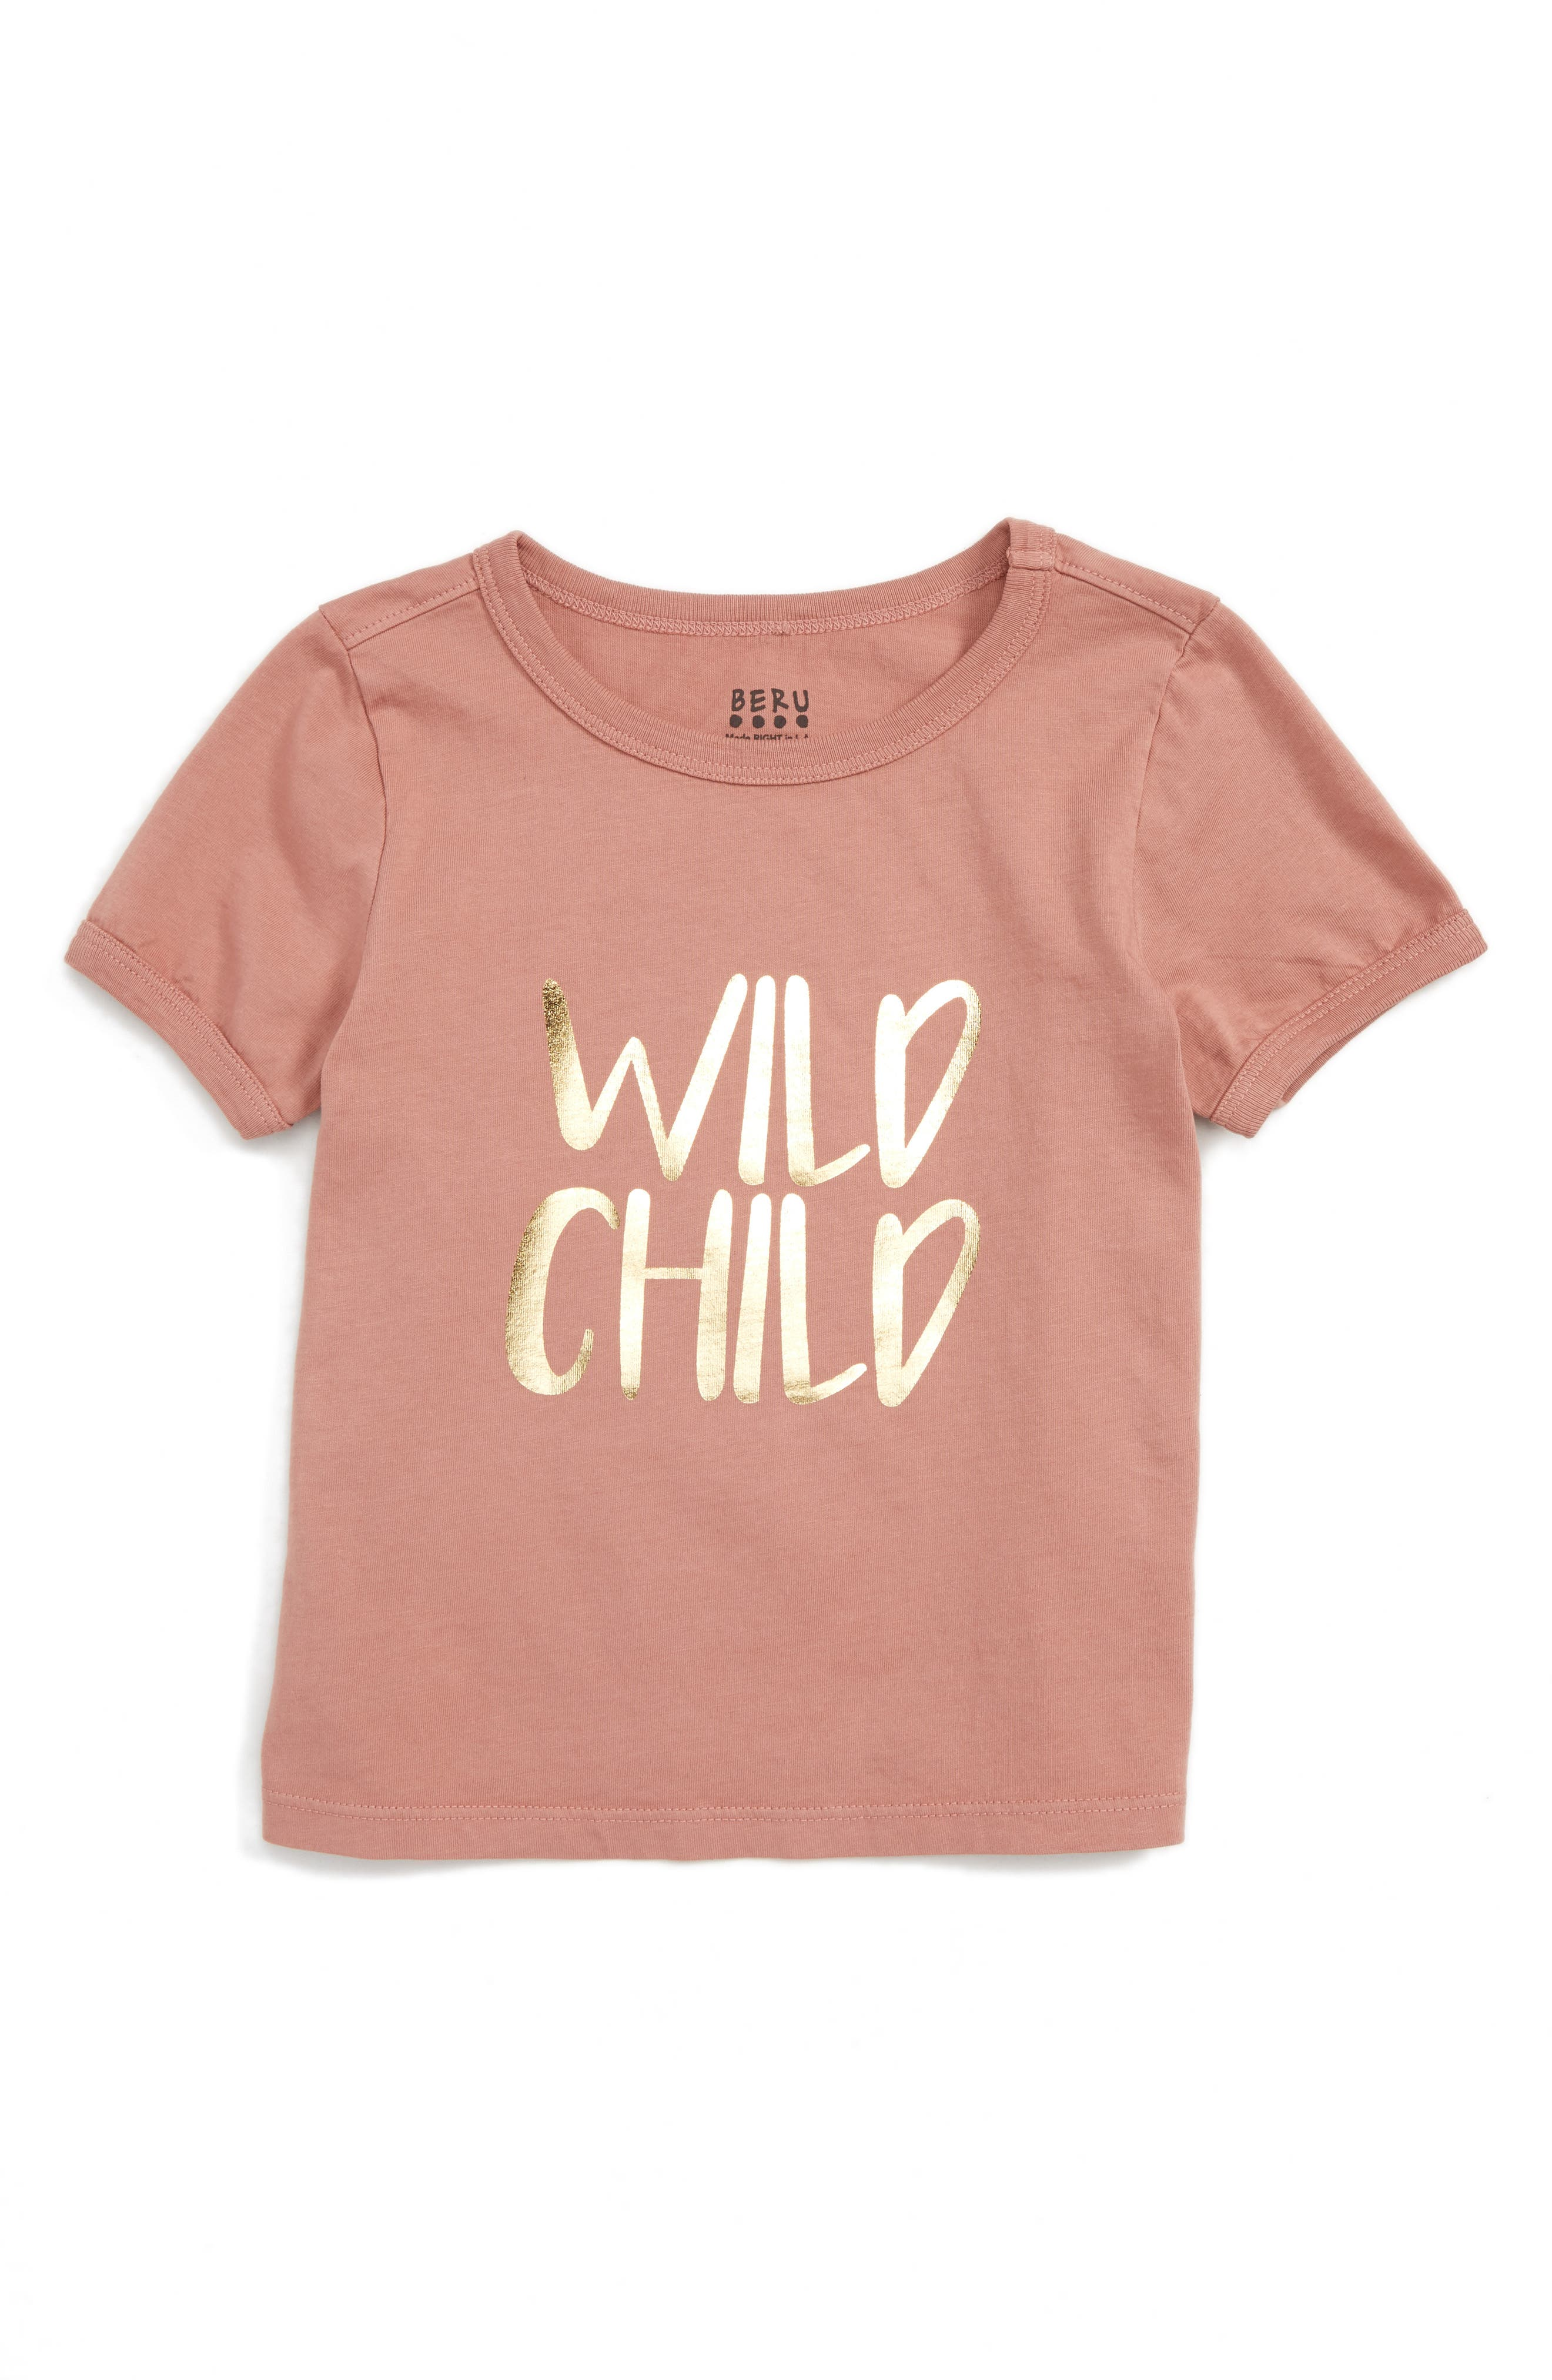 BERU Ava - Wild Child Organic Cotton Tee (Toddler Girls & Little Girls)